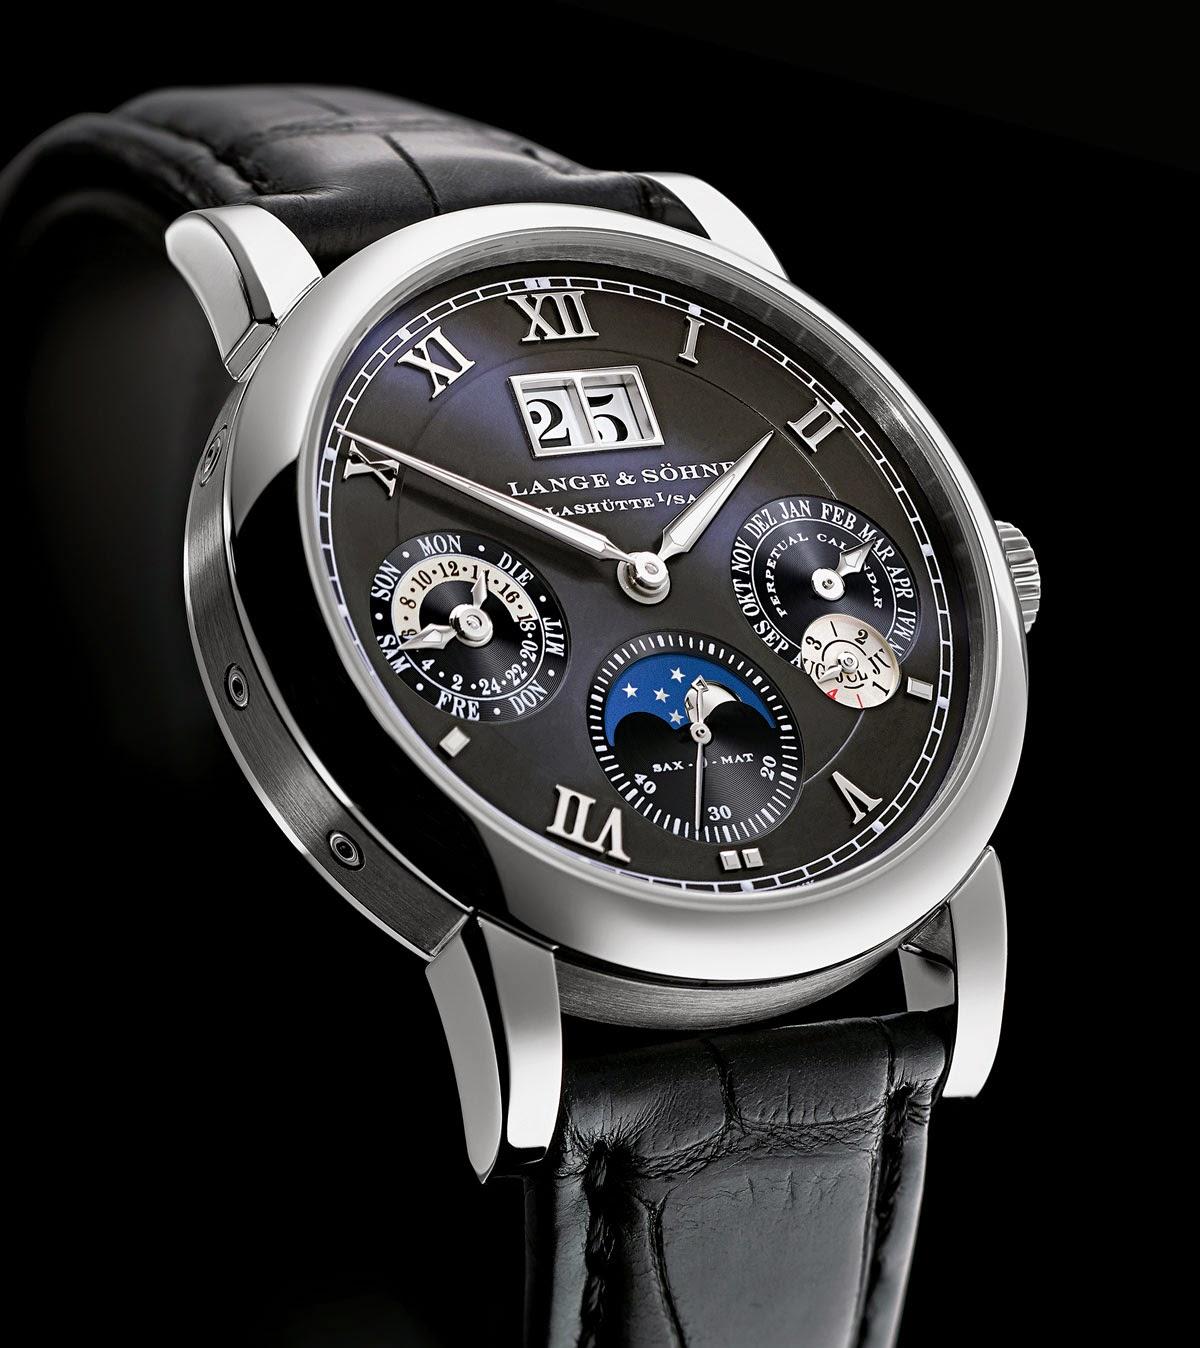 A. Lange & Sohne Langematik Perpetual replica watch